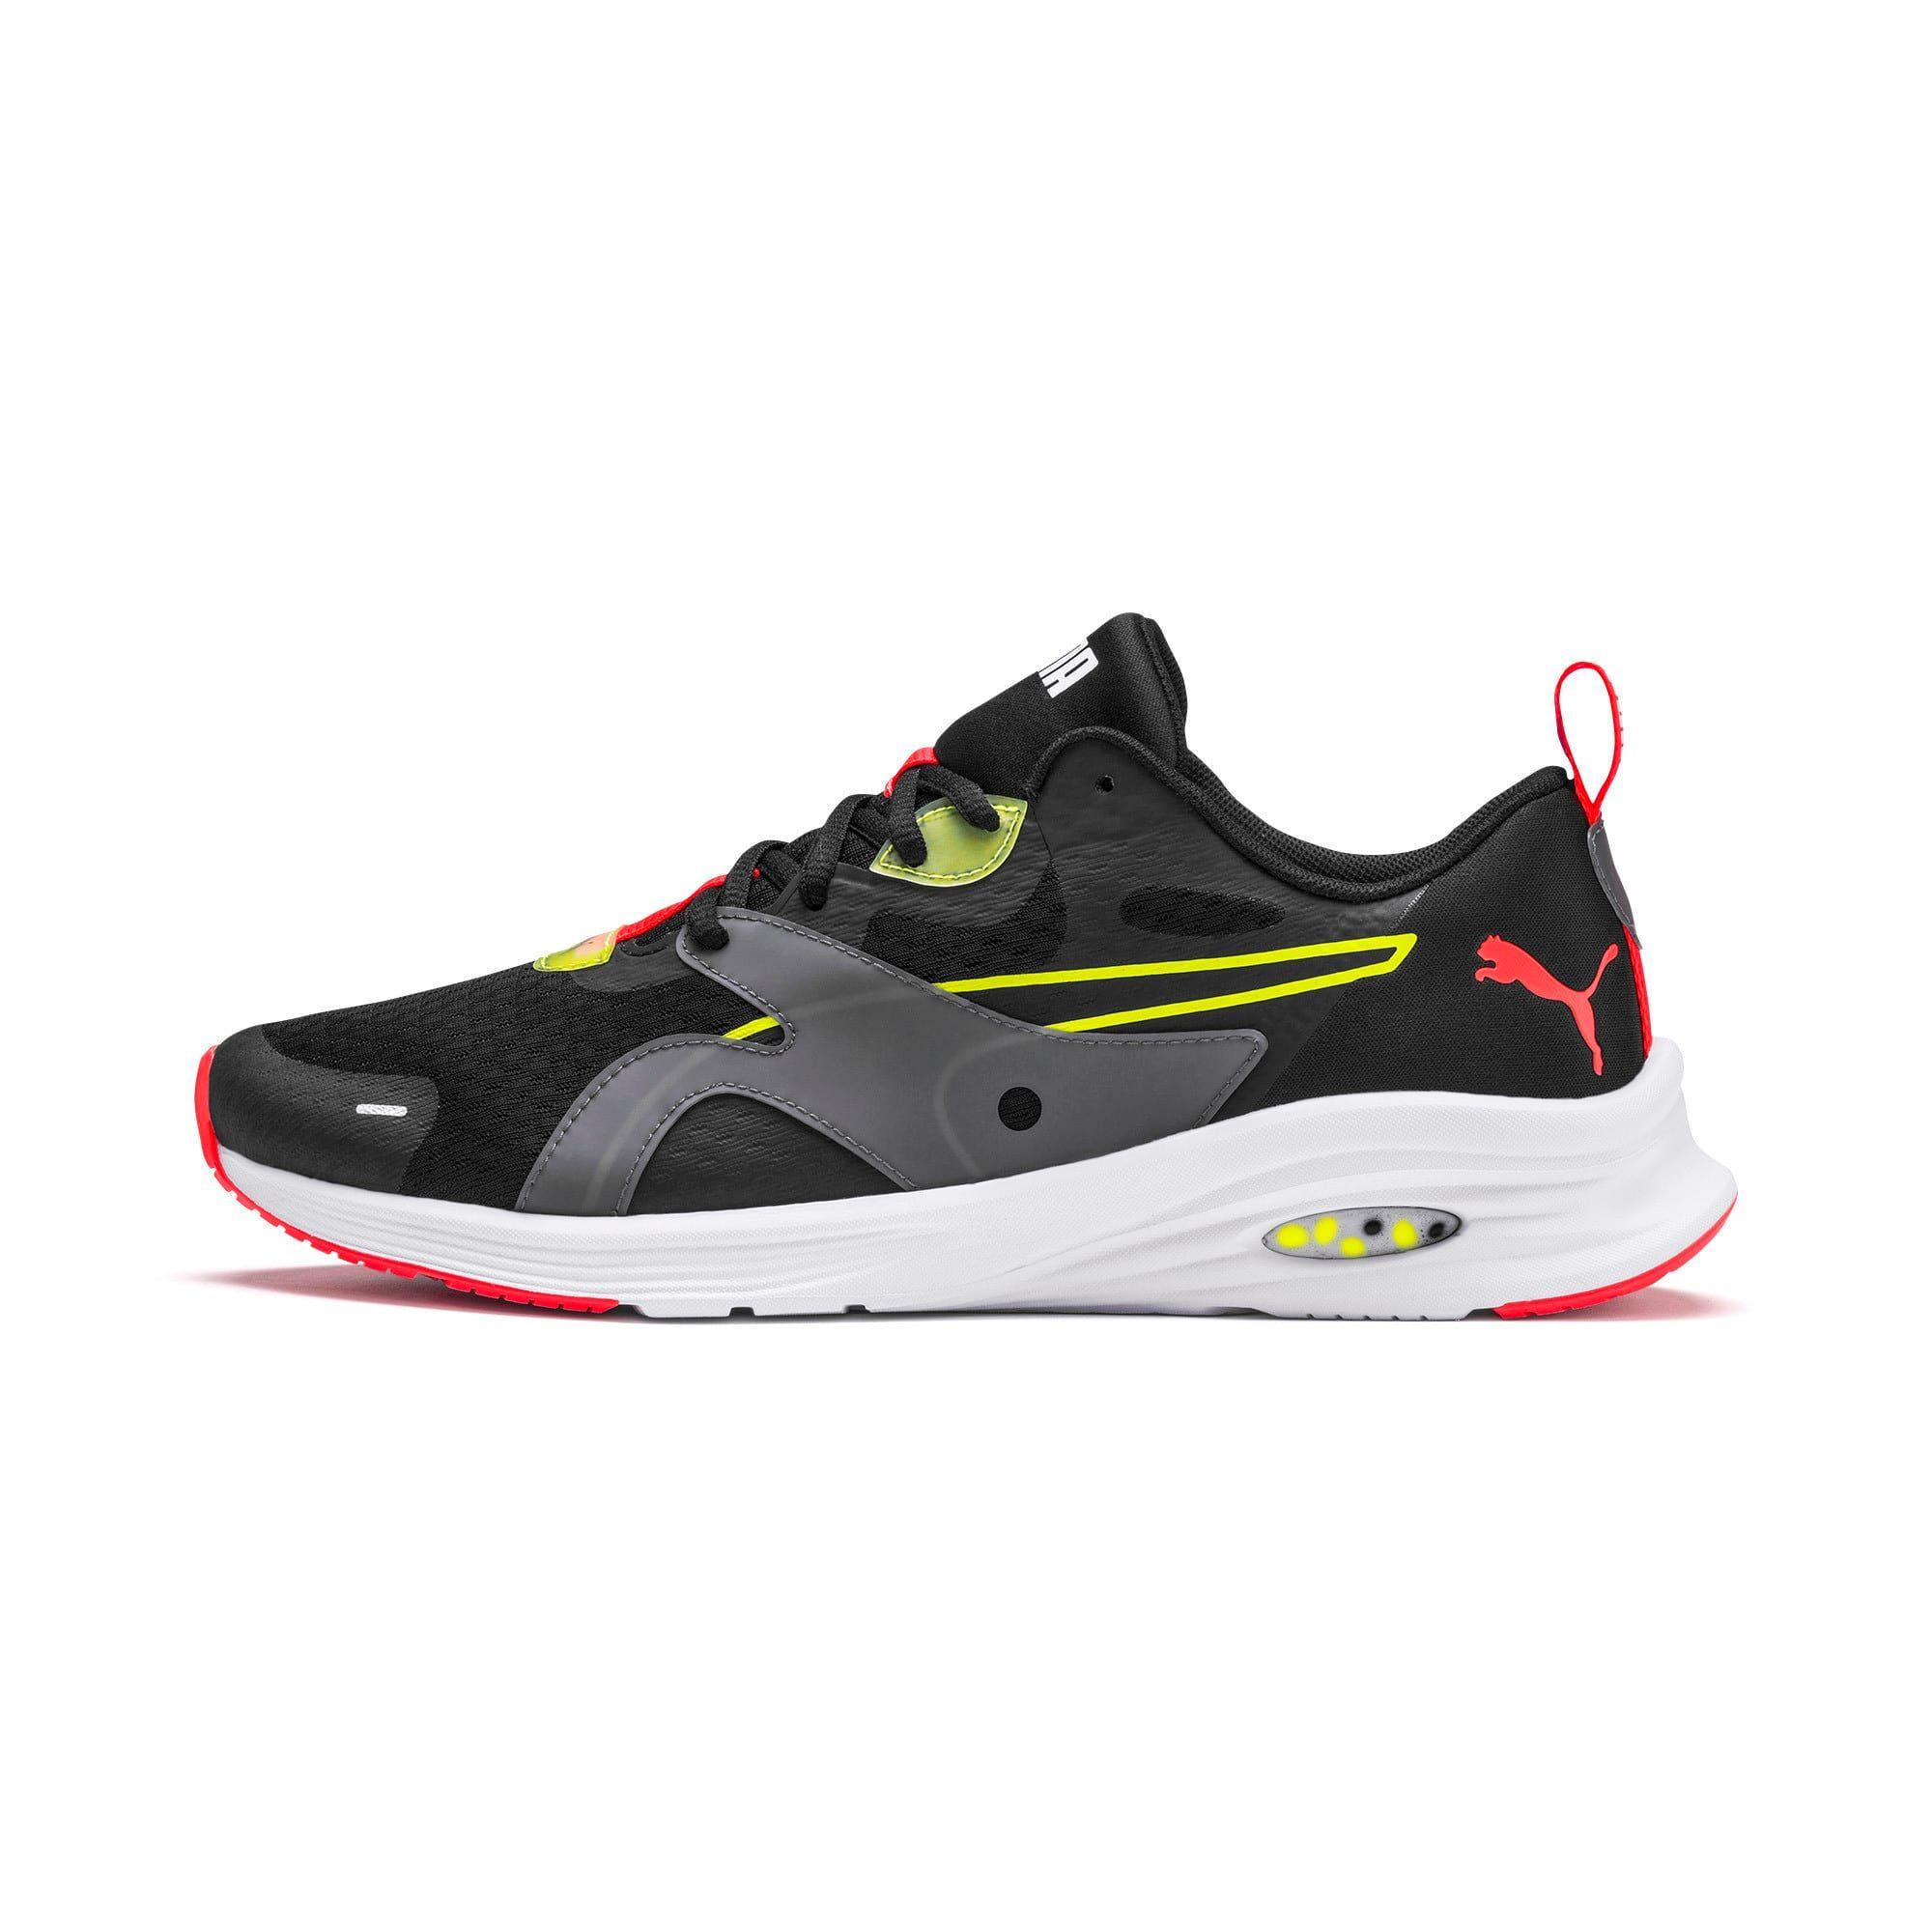 PUMA Hybrid Fuego Men's Running Shoes in Black/Yellow Alert size 10.5 #stylishmen